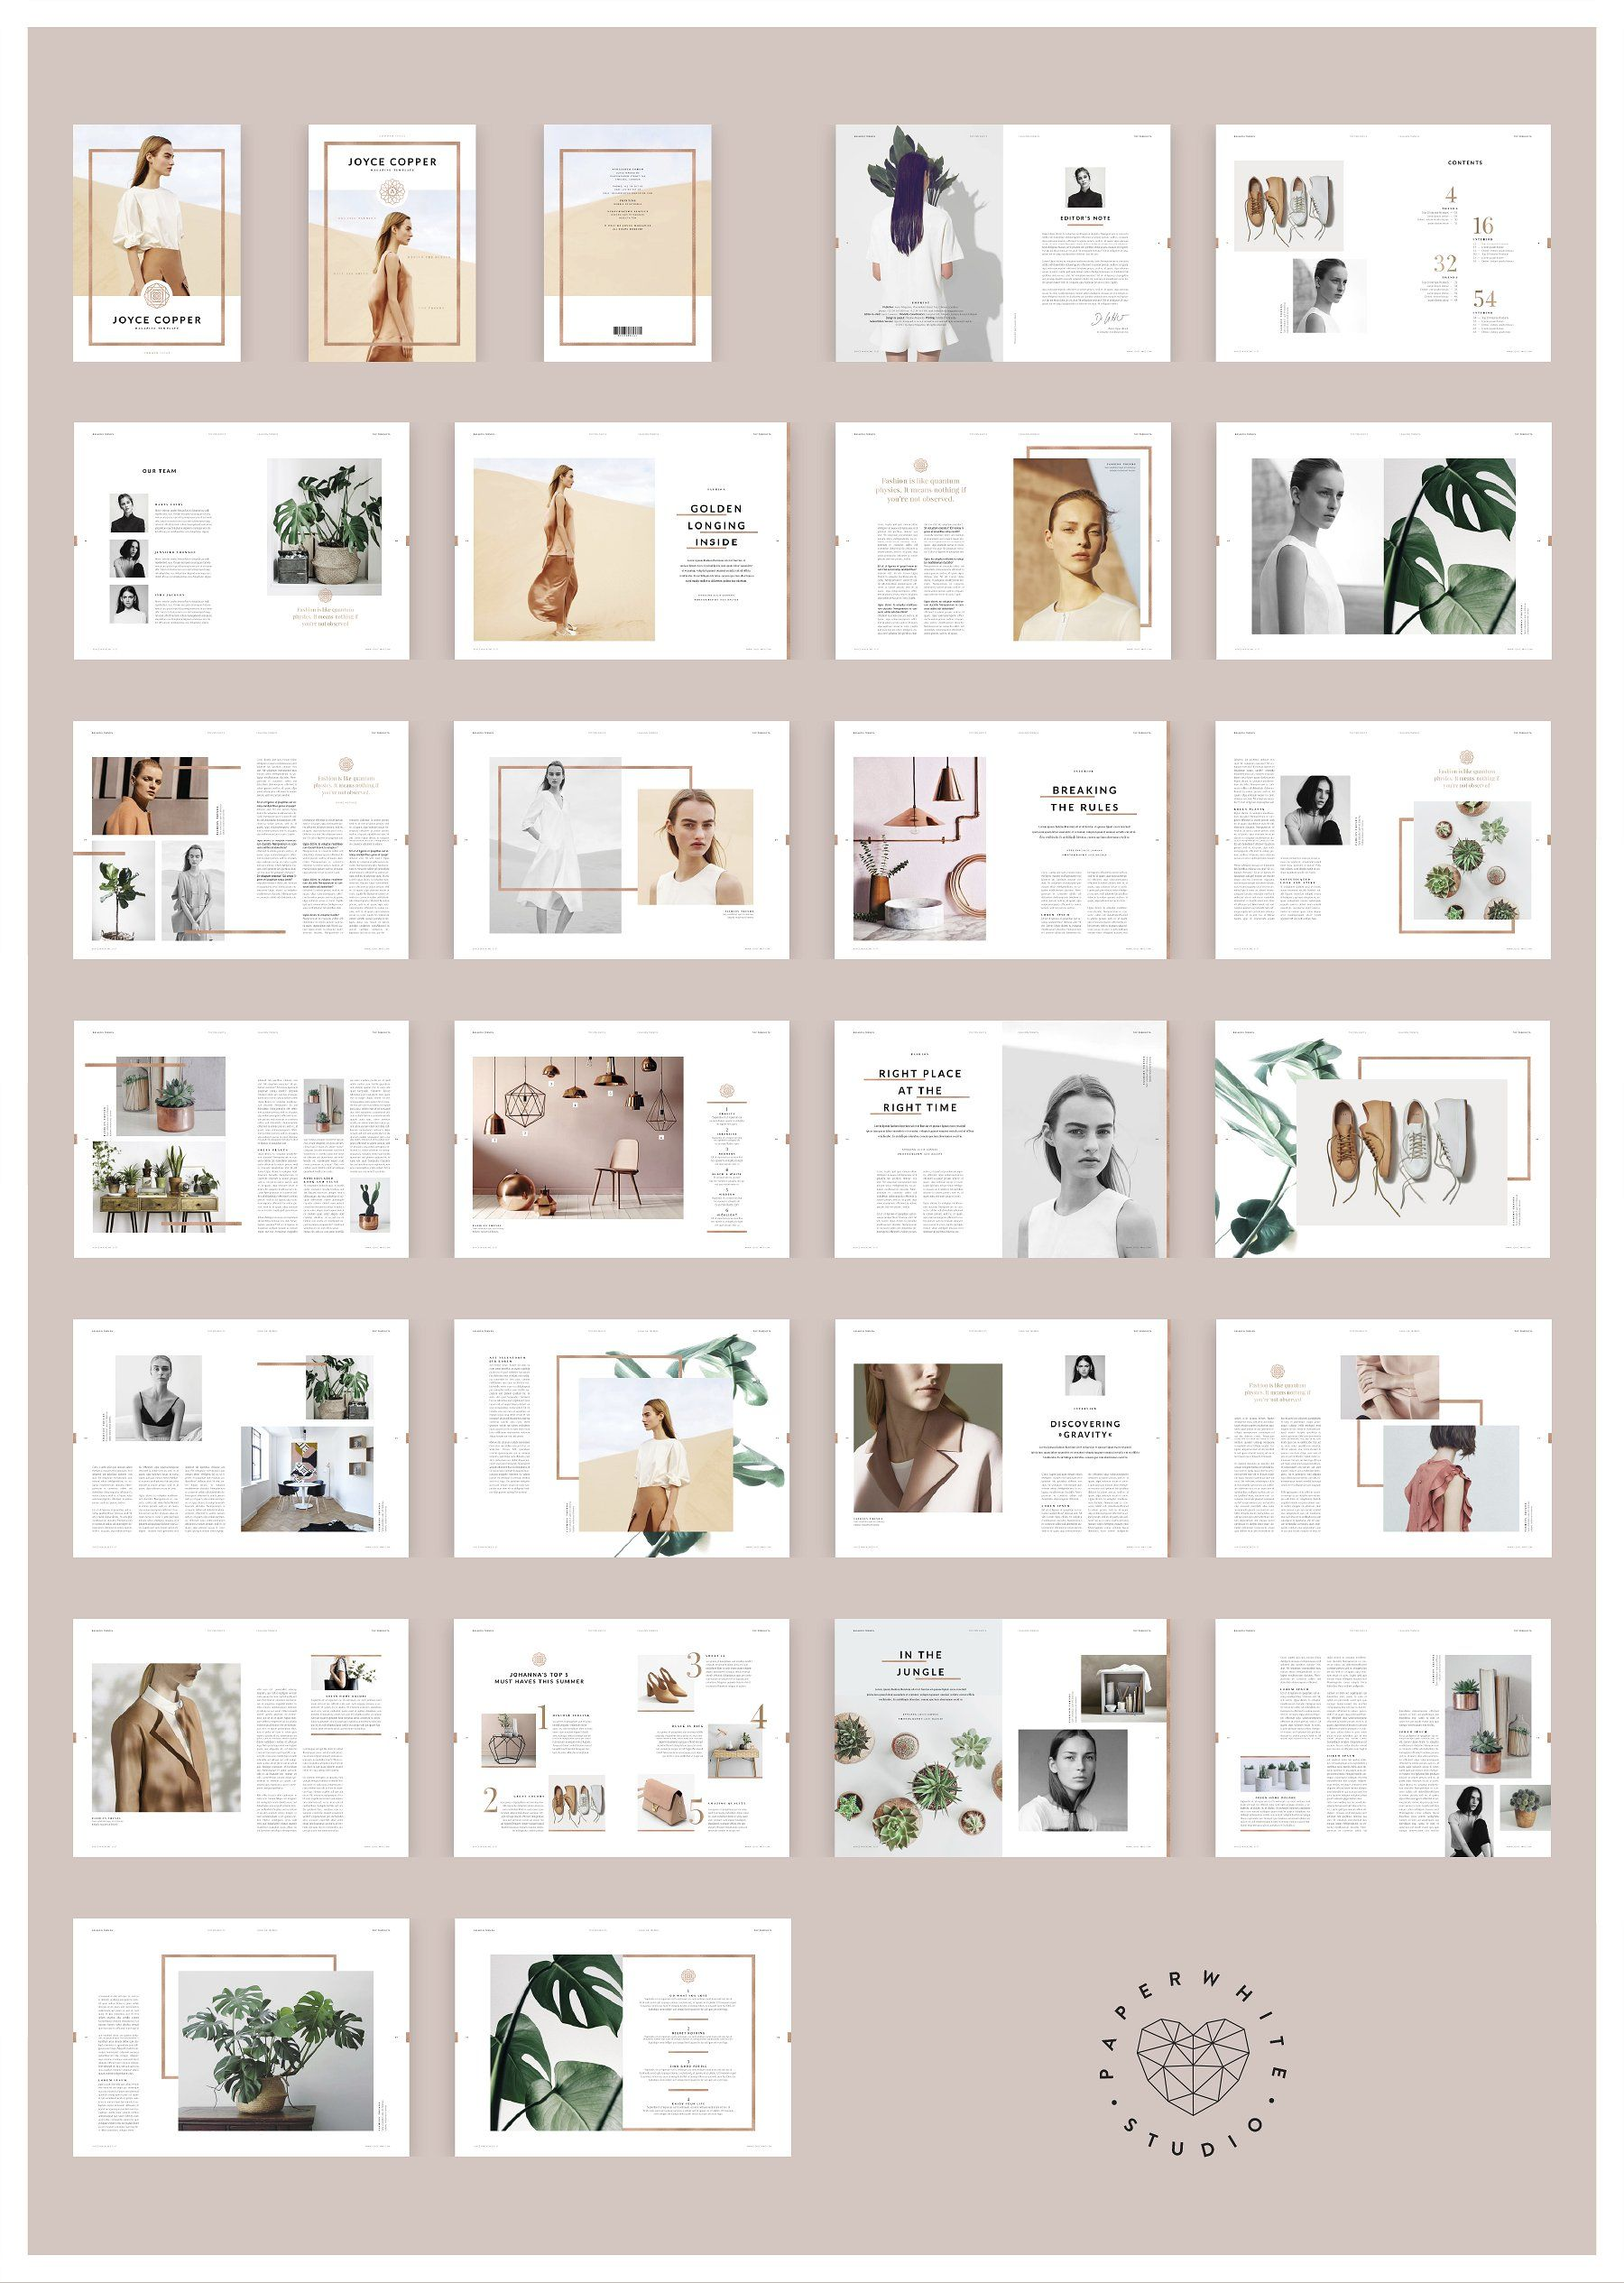 JOYCE Copper Magazine | Katalog, Magazin und Fotos